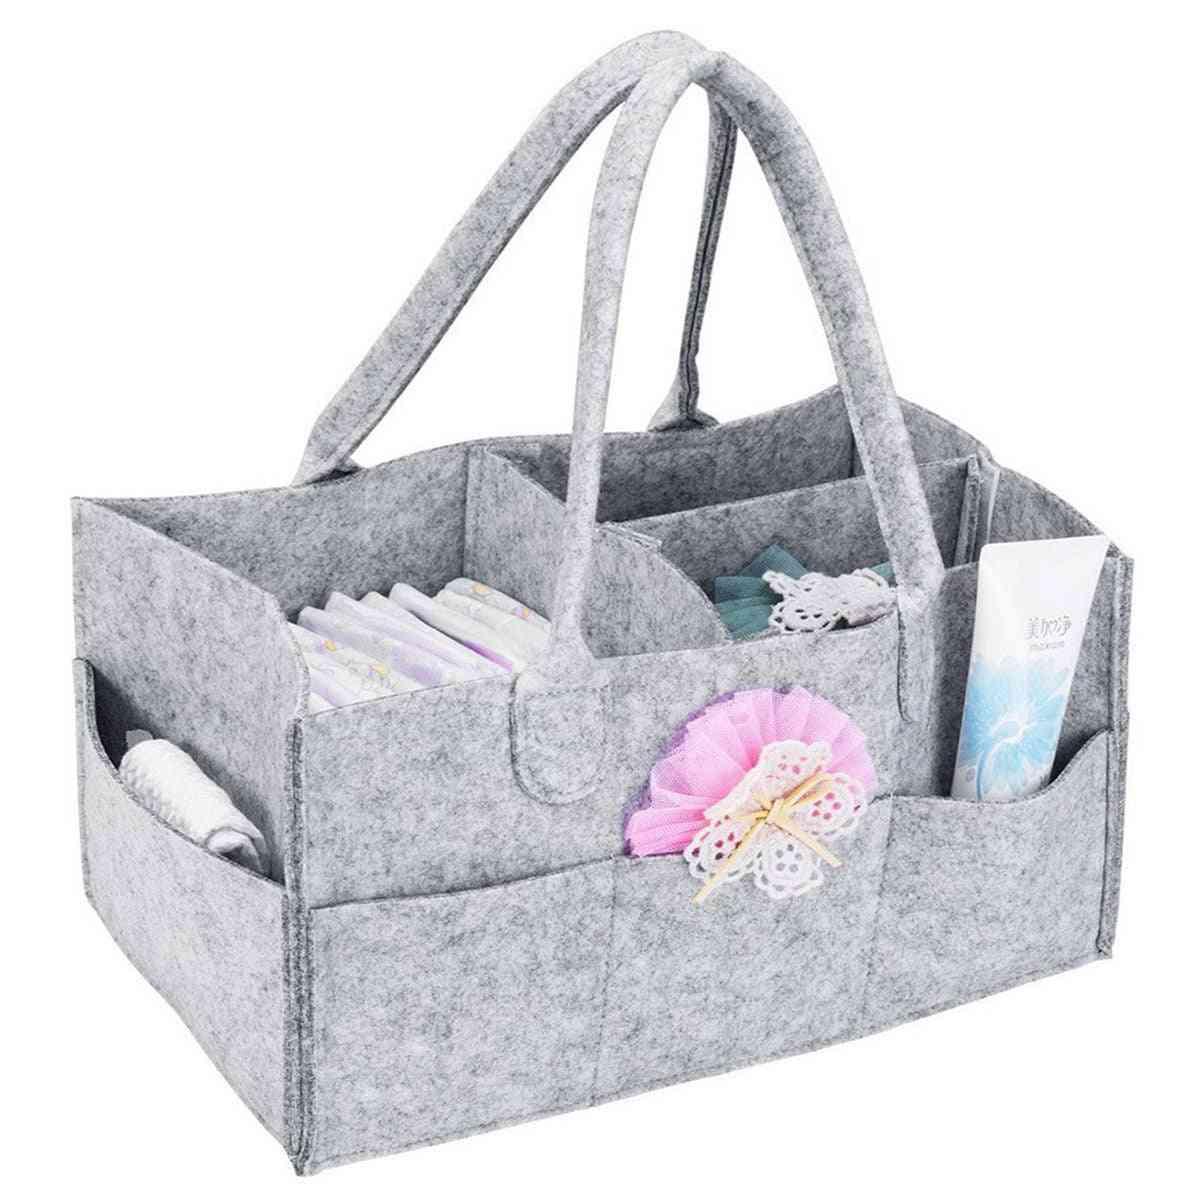 Baby Diaper Caddy Nursery Wipes Handbag, Portable Basket Nappy Organizer